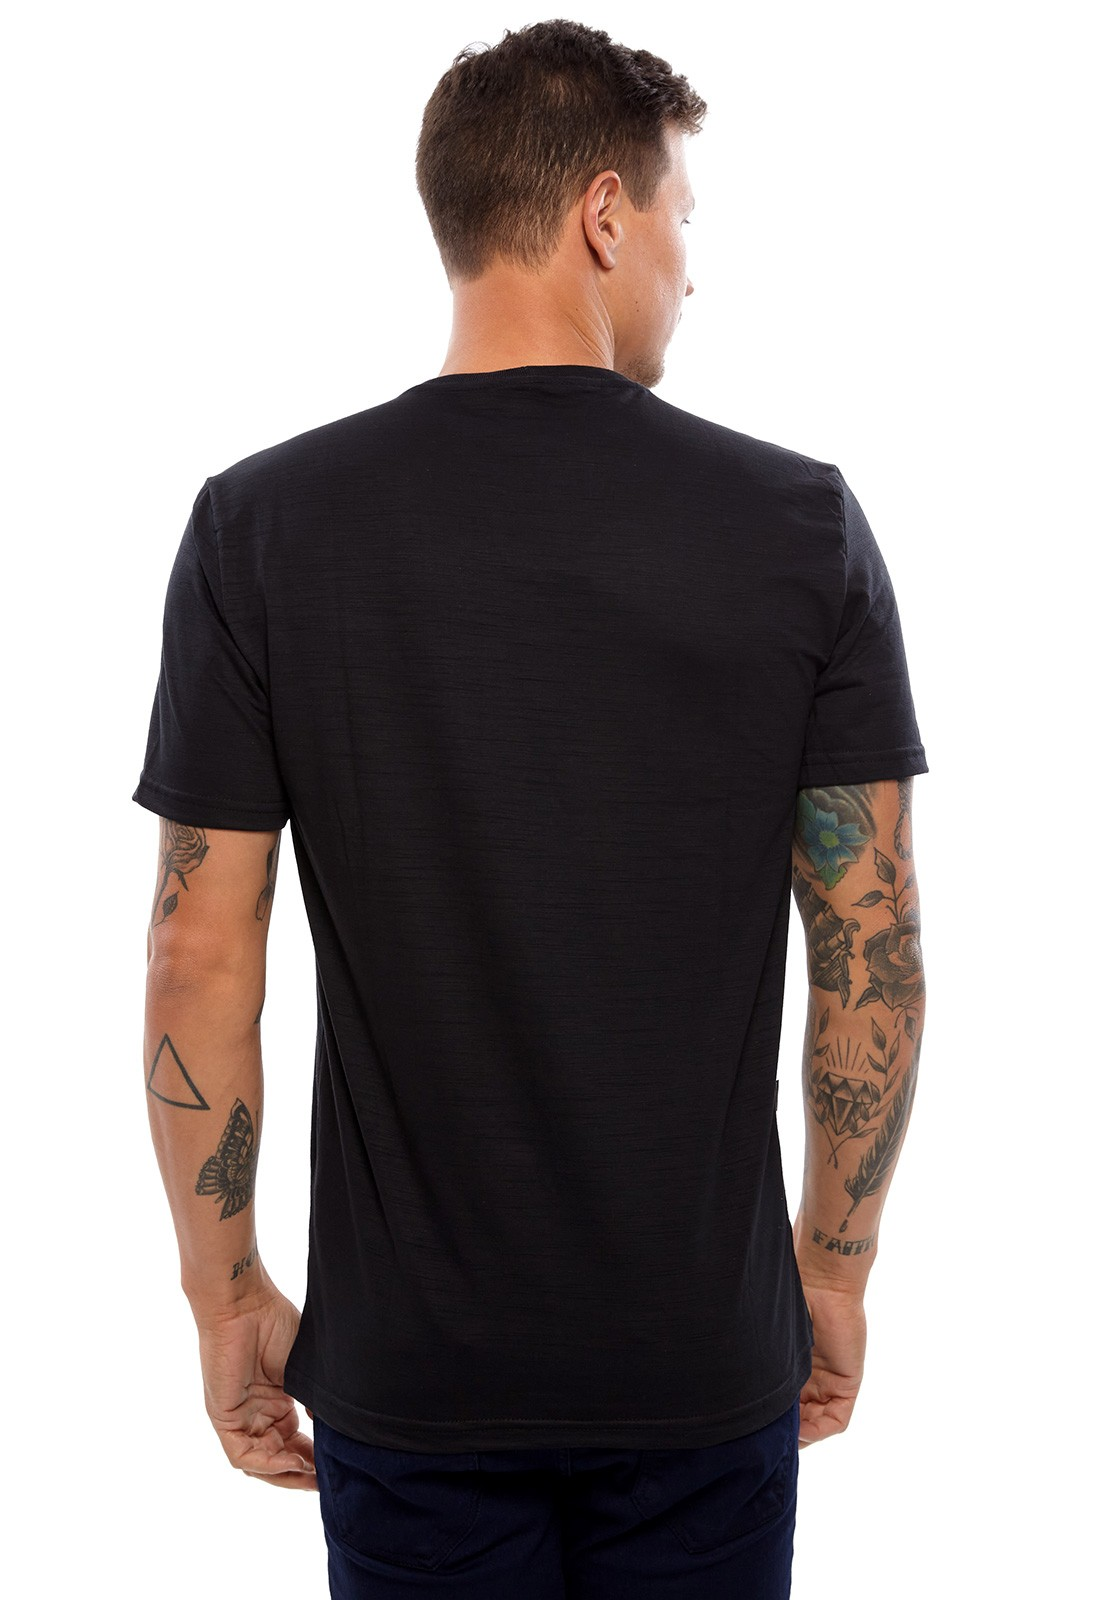 Camiseta Vida Marinha Manga Curta Flamê Preto